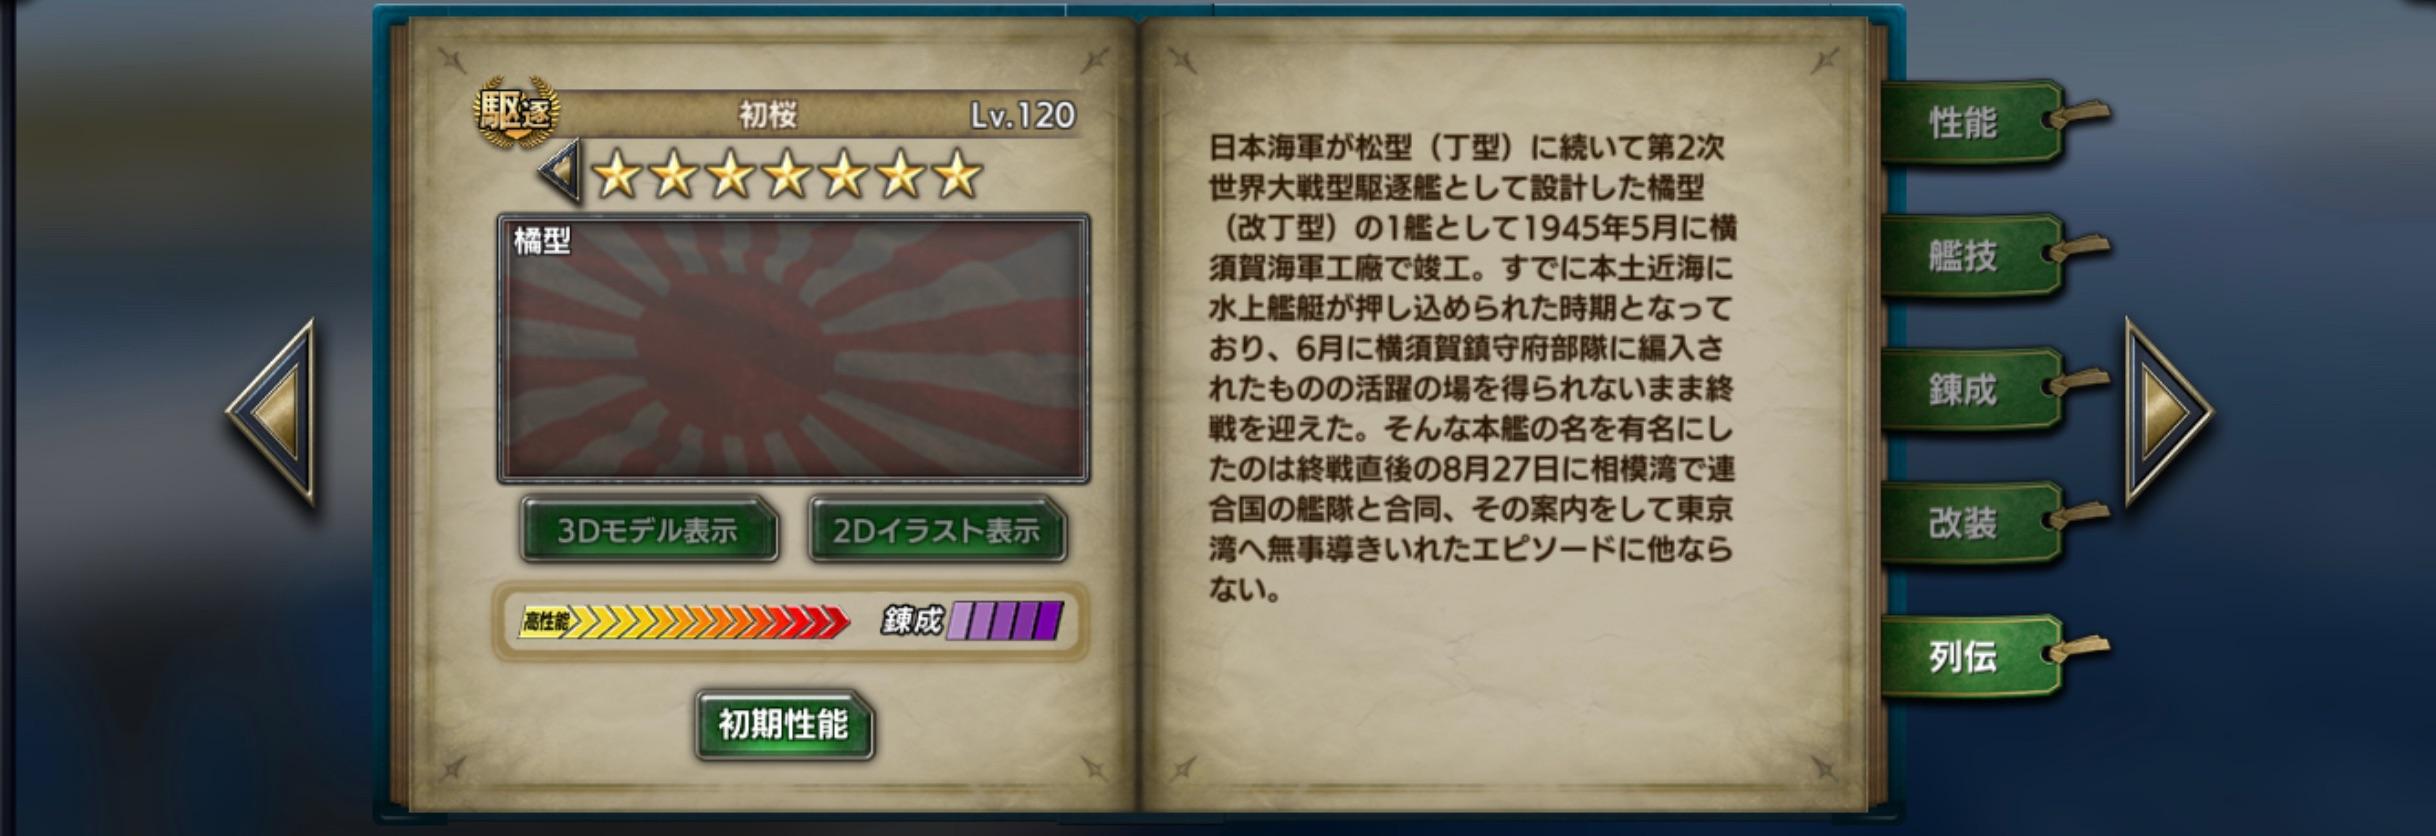 Hatsuzakura-history